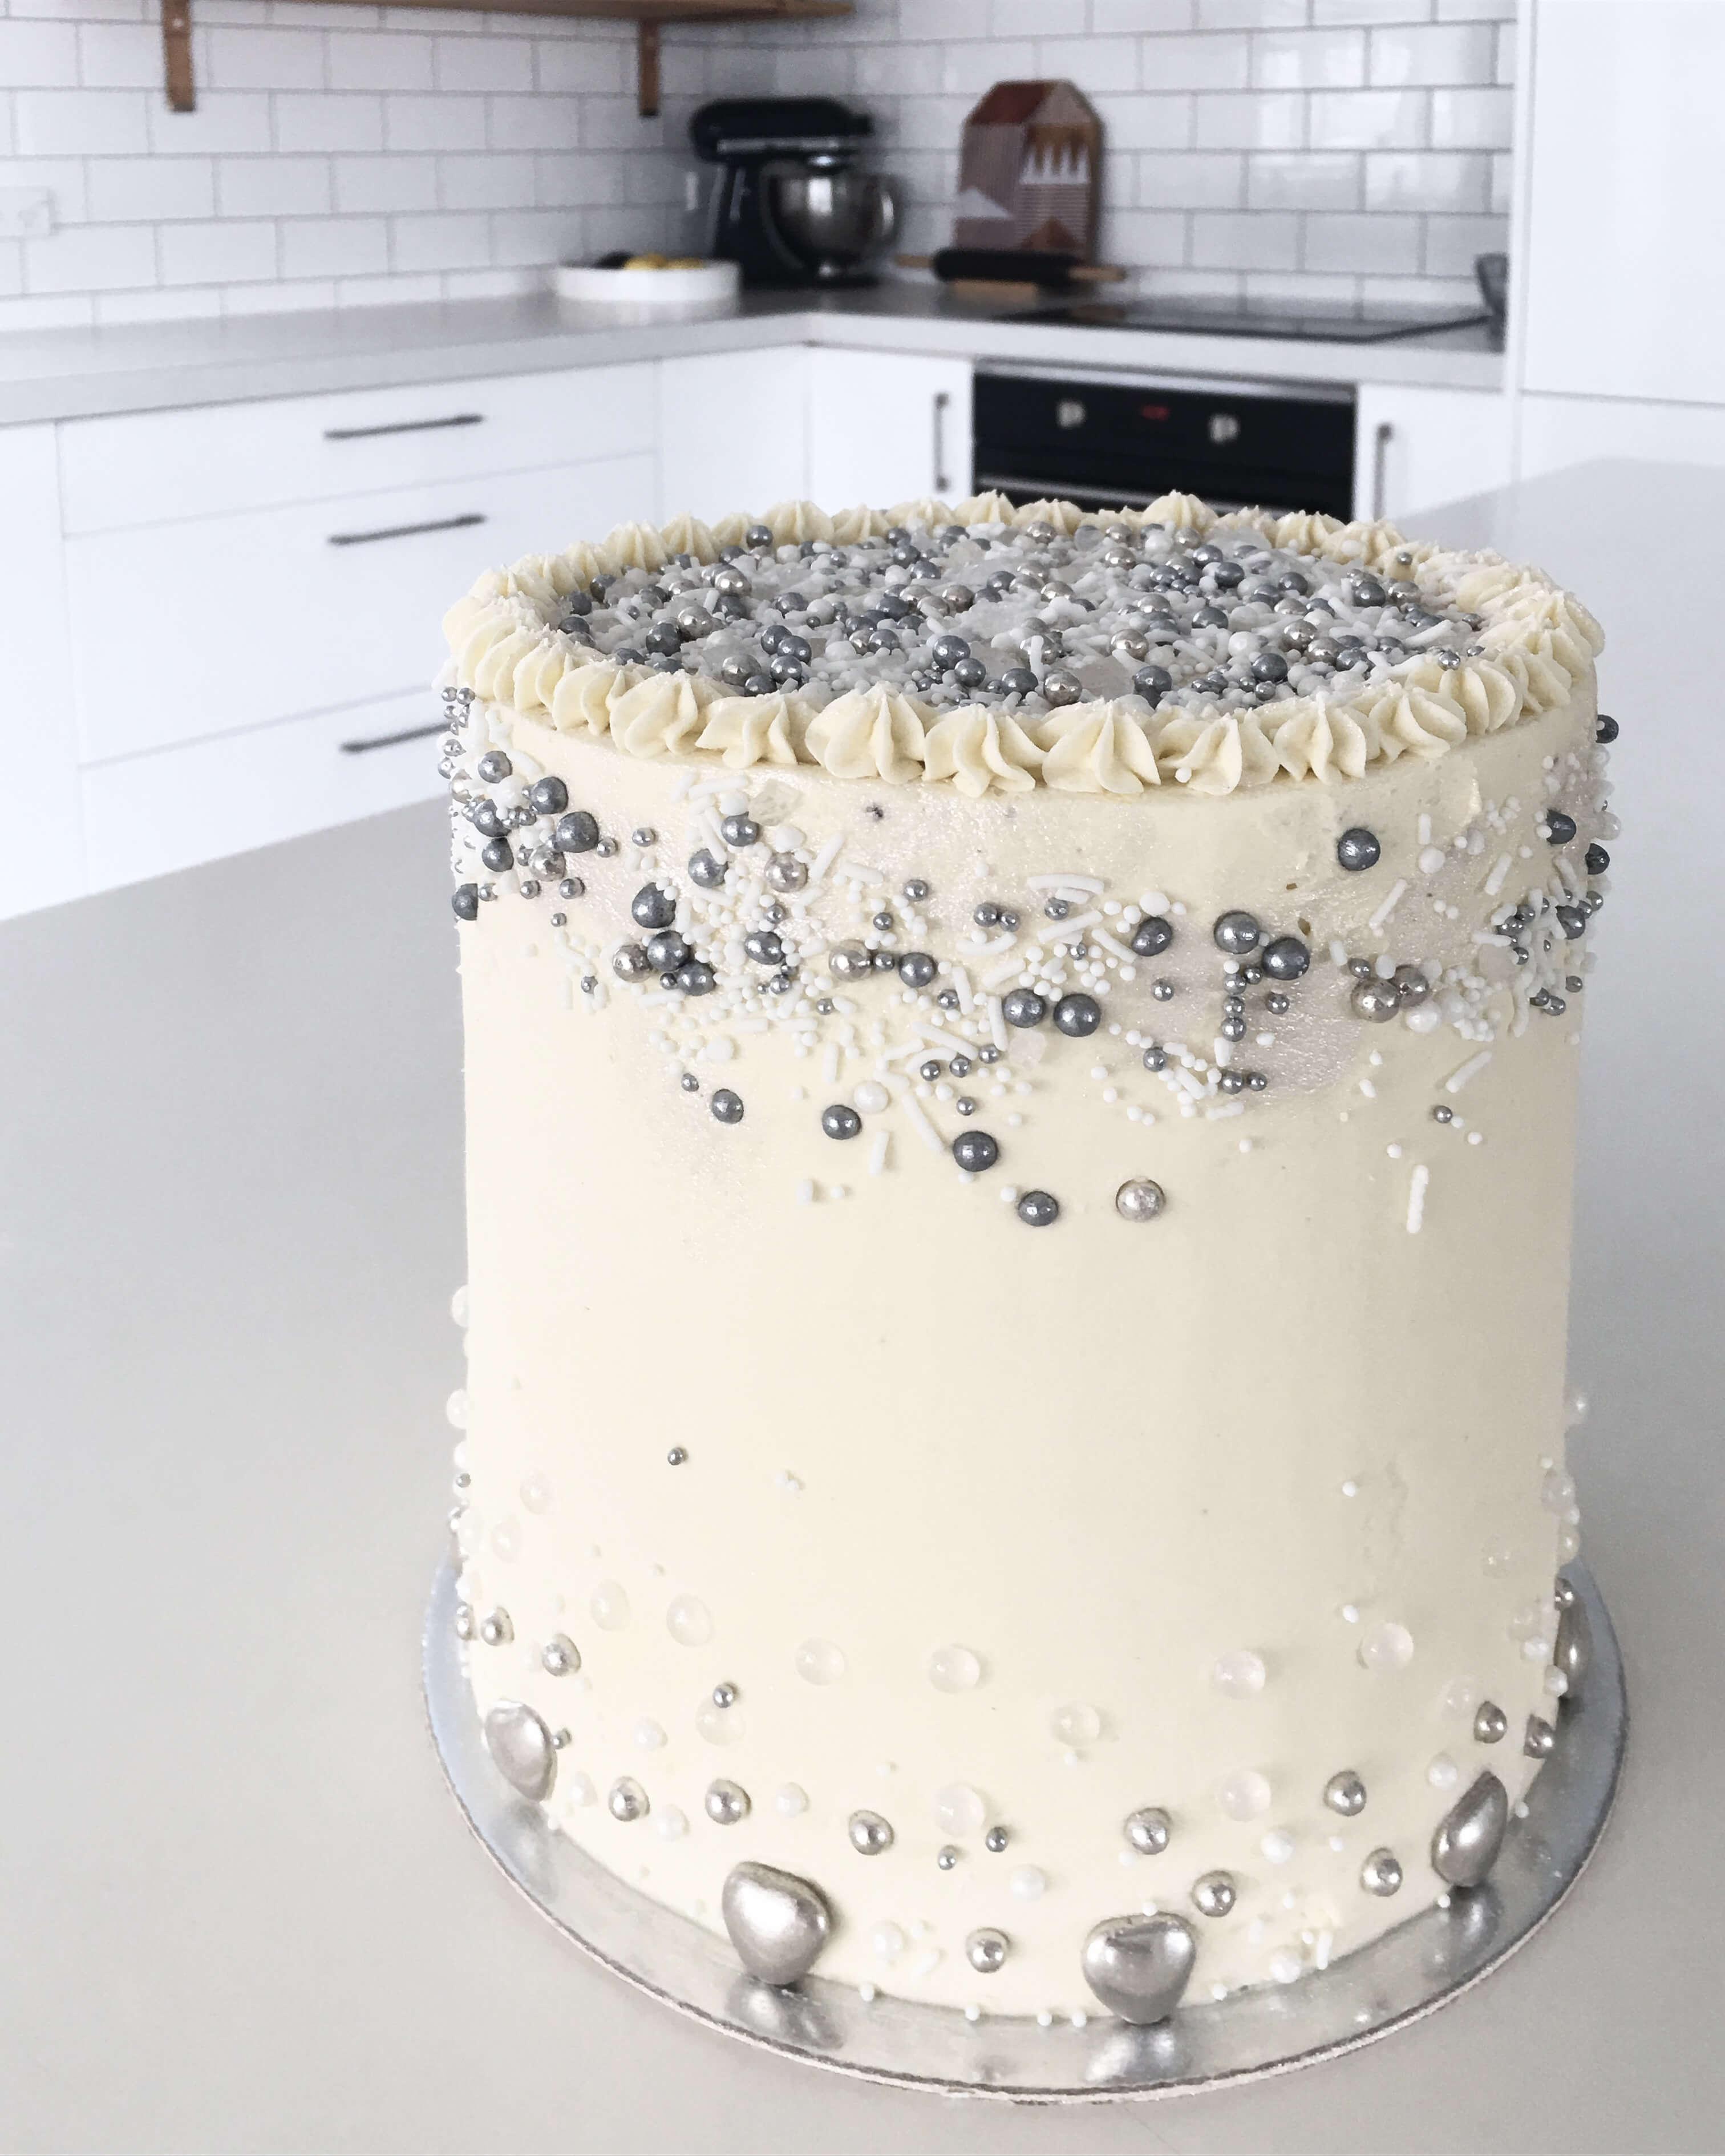 amazing cakes by duke of sugar 17 (1)